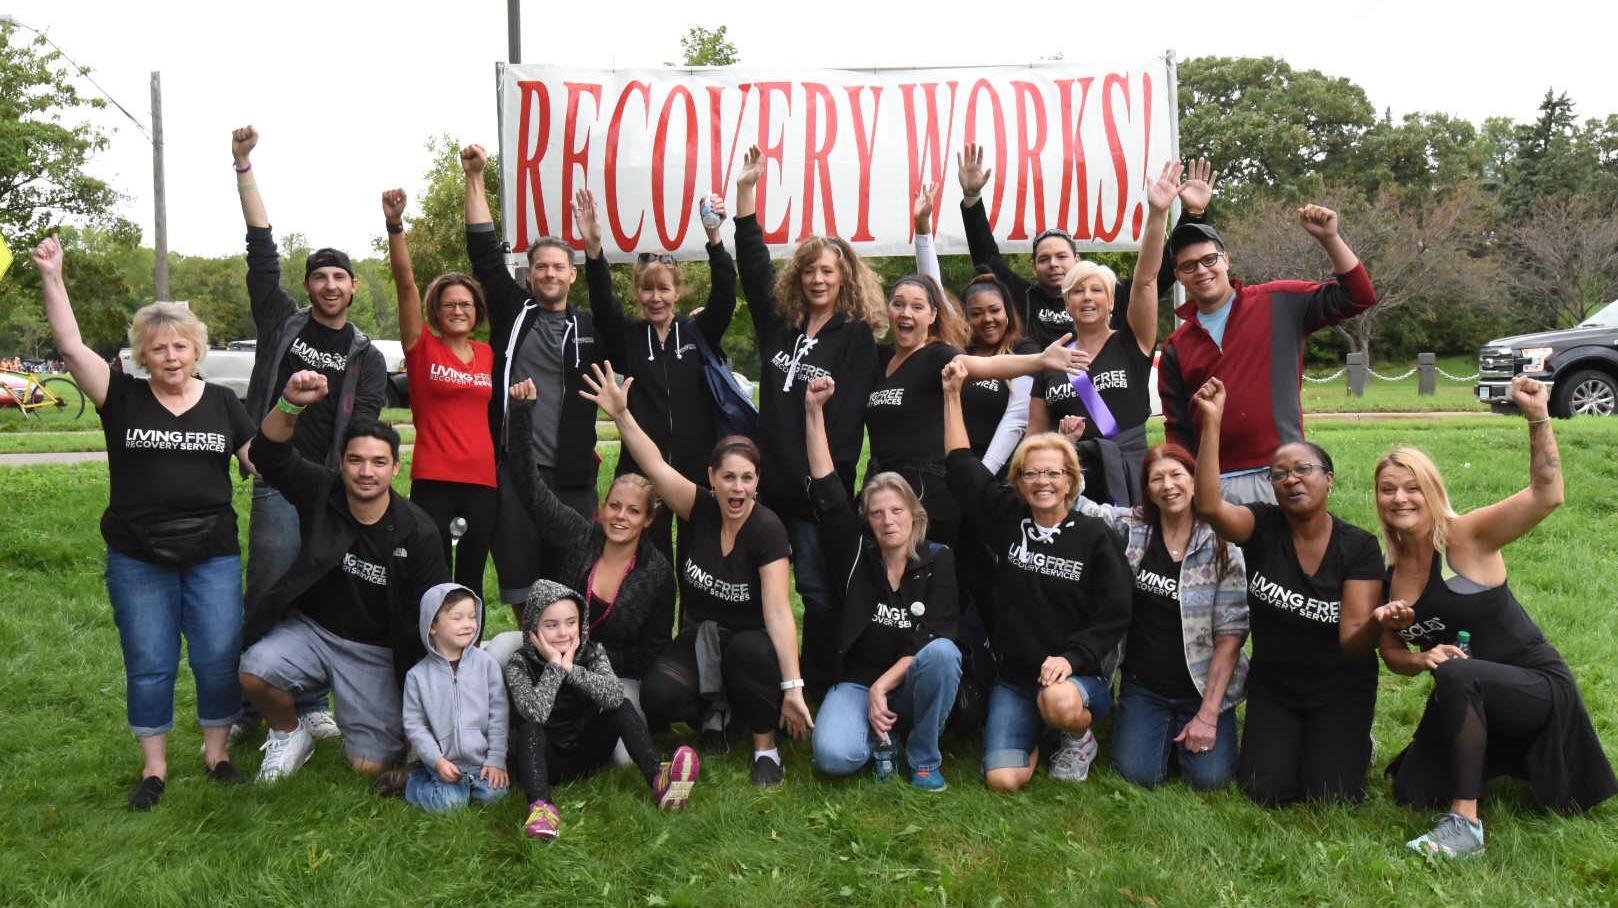 Recovery Walk Group Photo.jpg